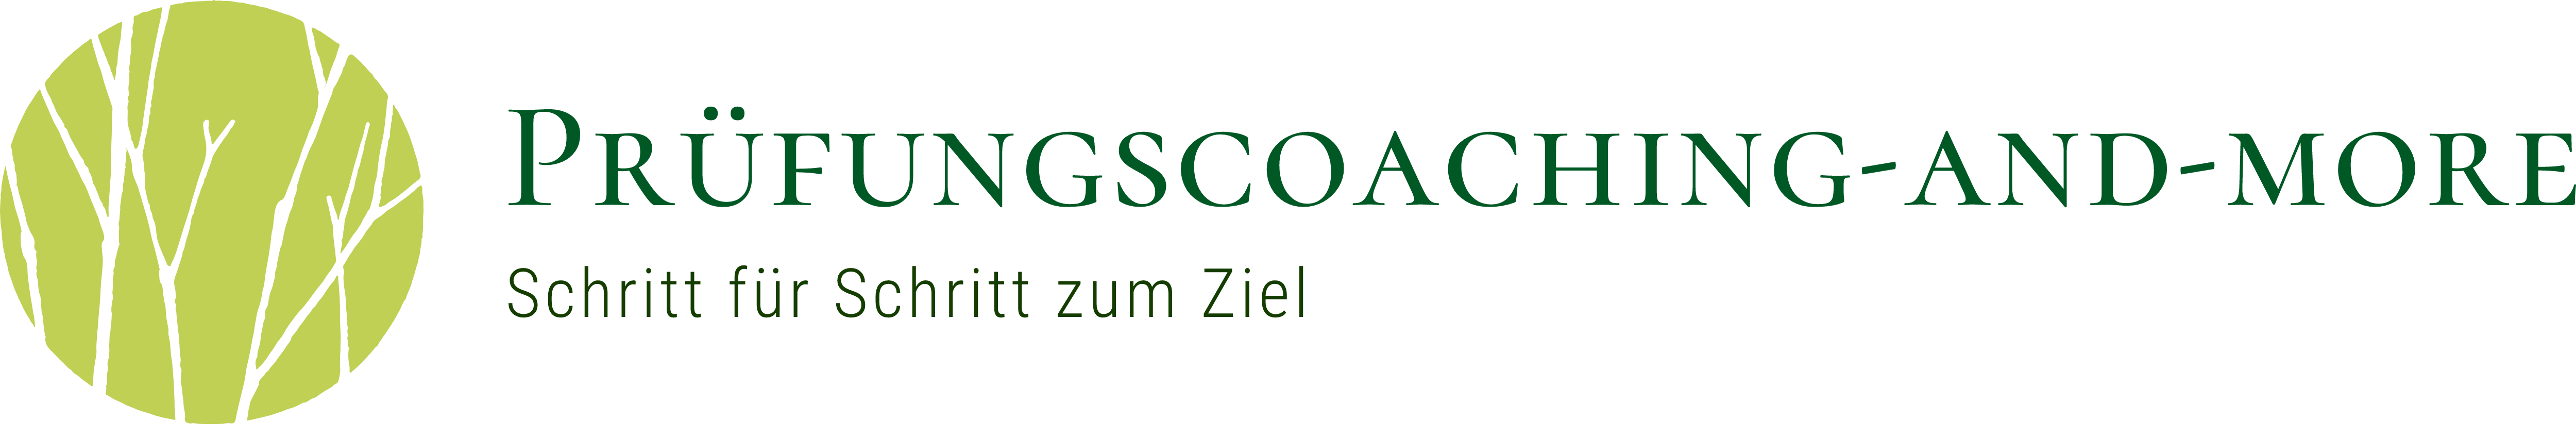 Logo: Prüfungscoaching